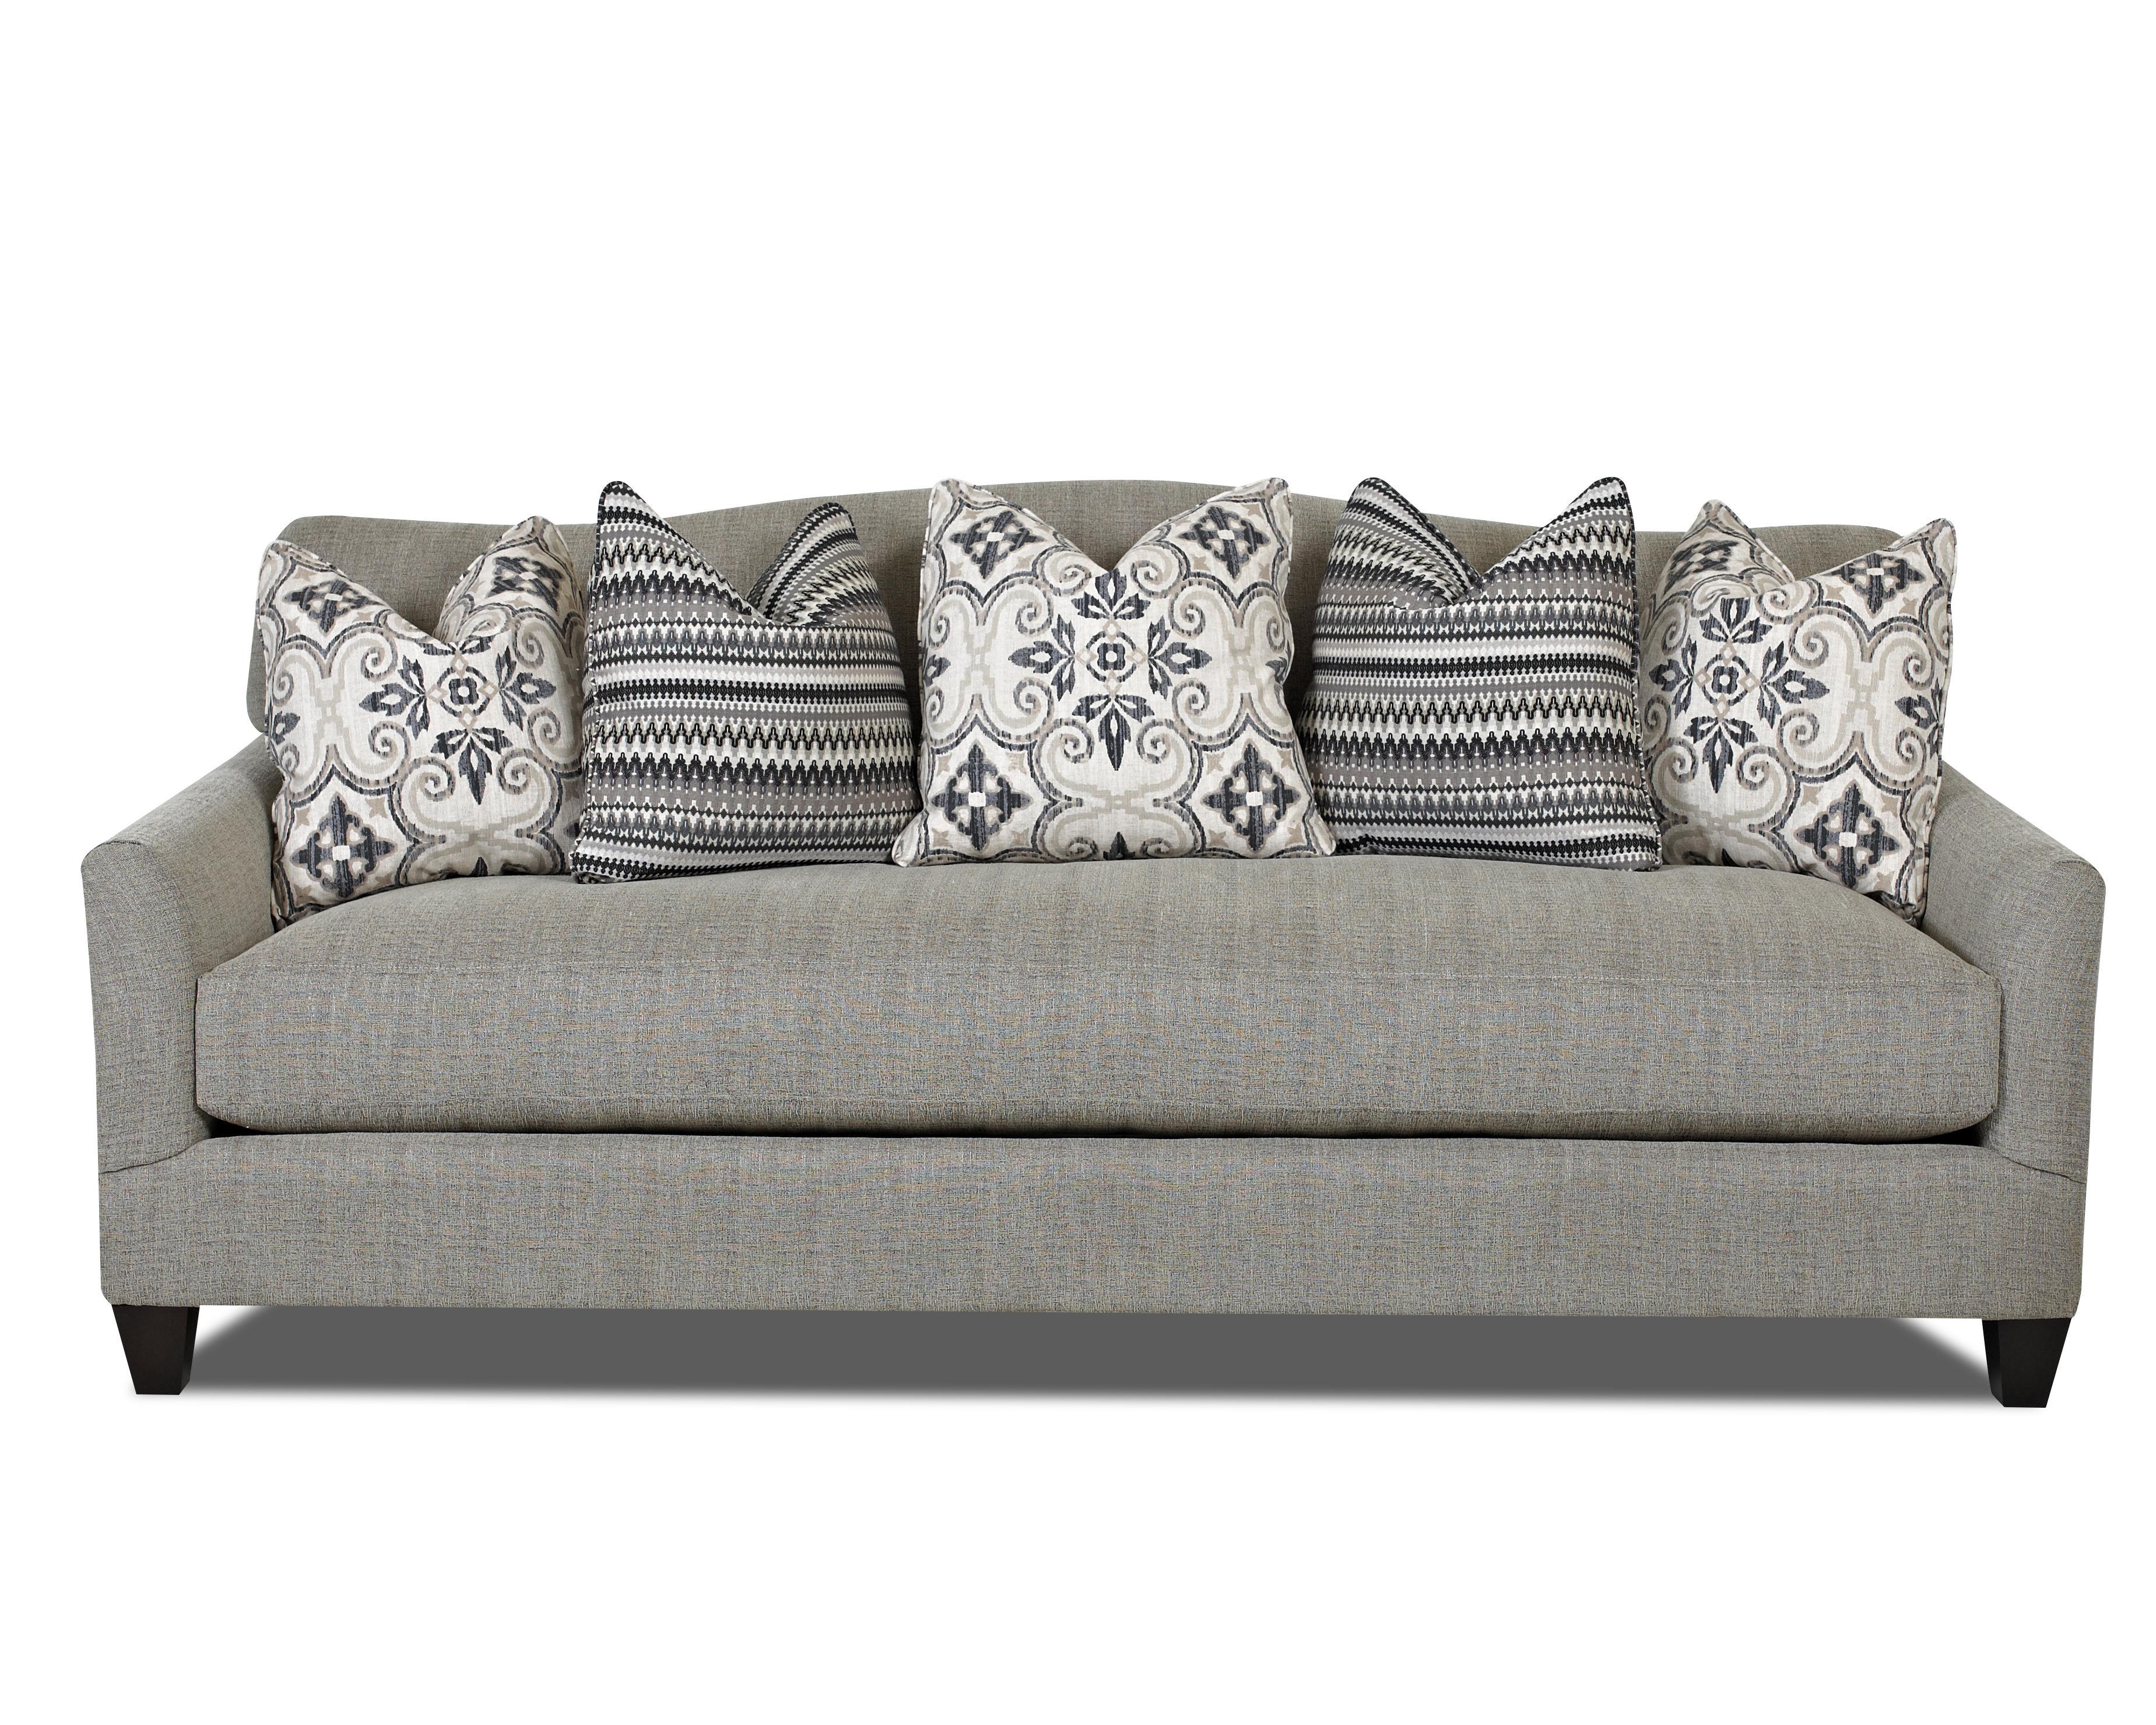 Sofa : leighton20313d3130020s b6 from www.wolffurniture.com size 3698 x 2958 jpeg 1410kB